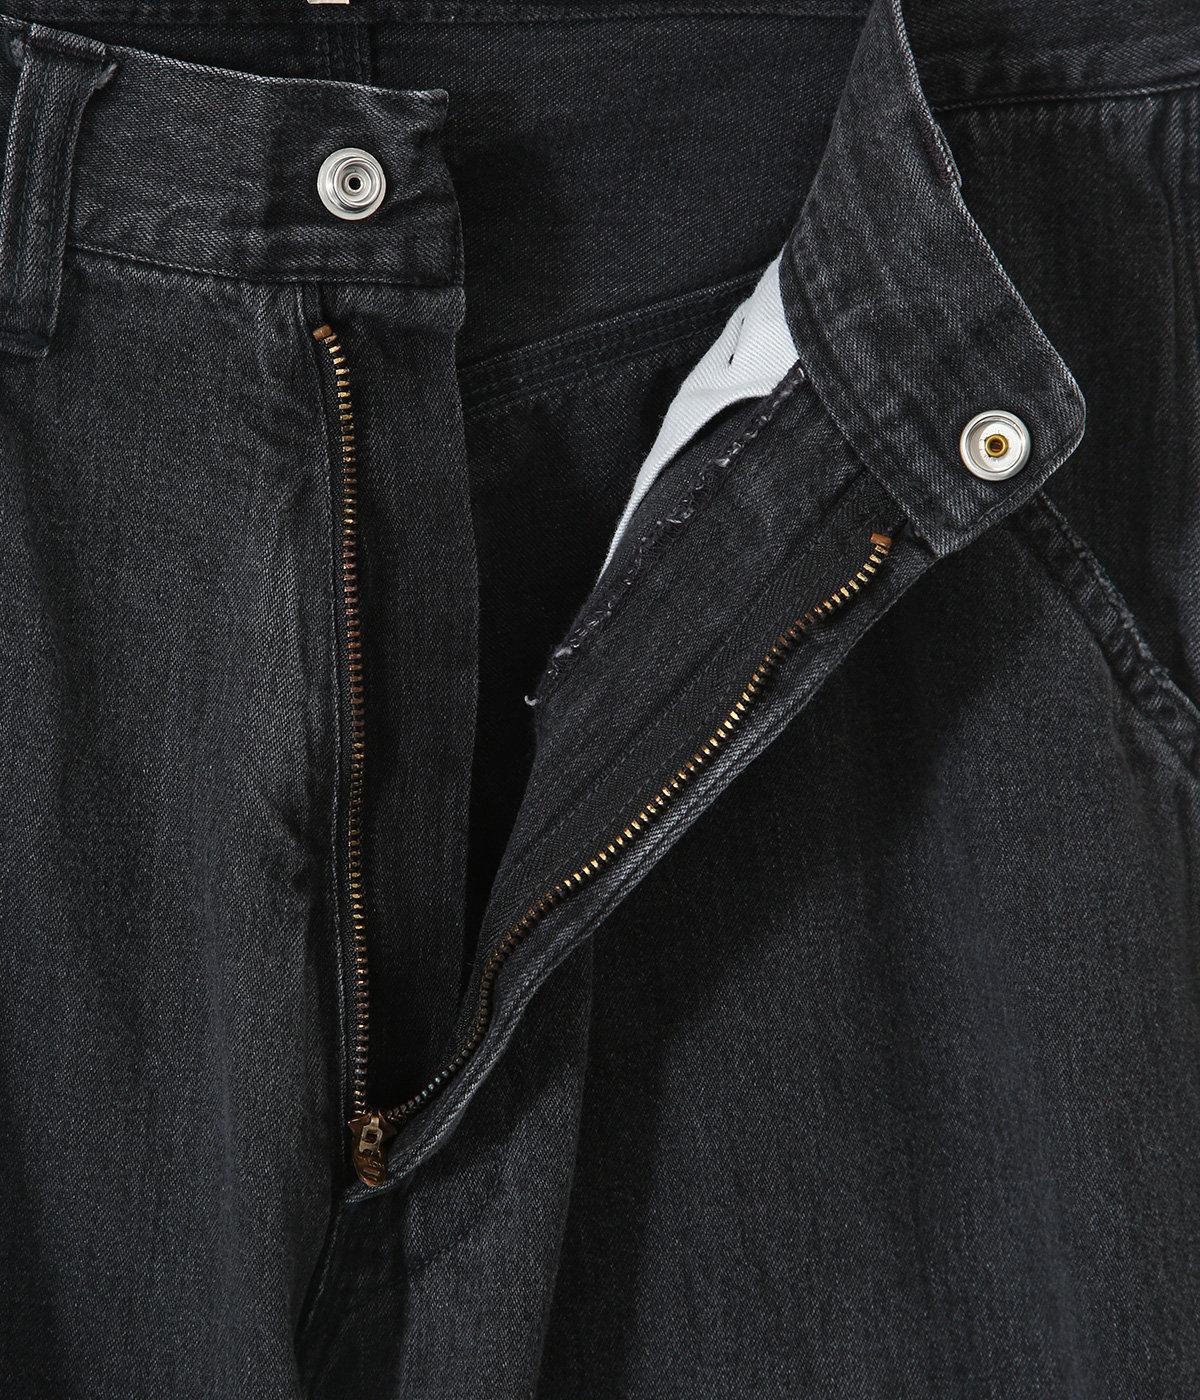 10.5oz JELT DENIM PAINTER PANTS AGING MODEL HARD WASH